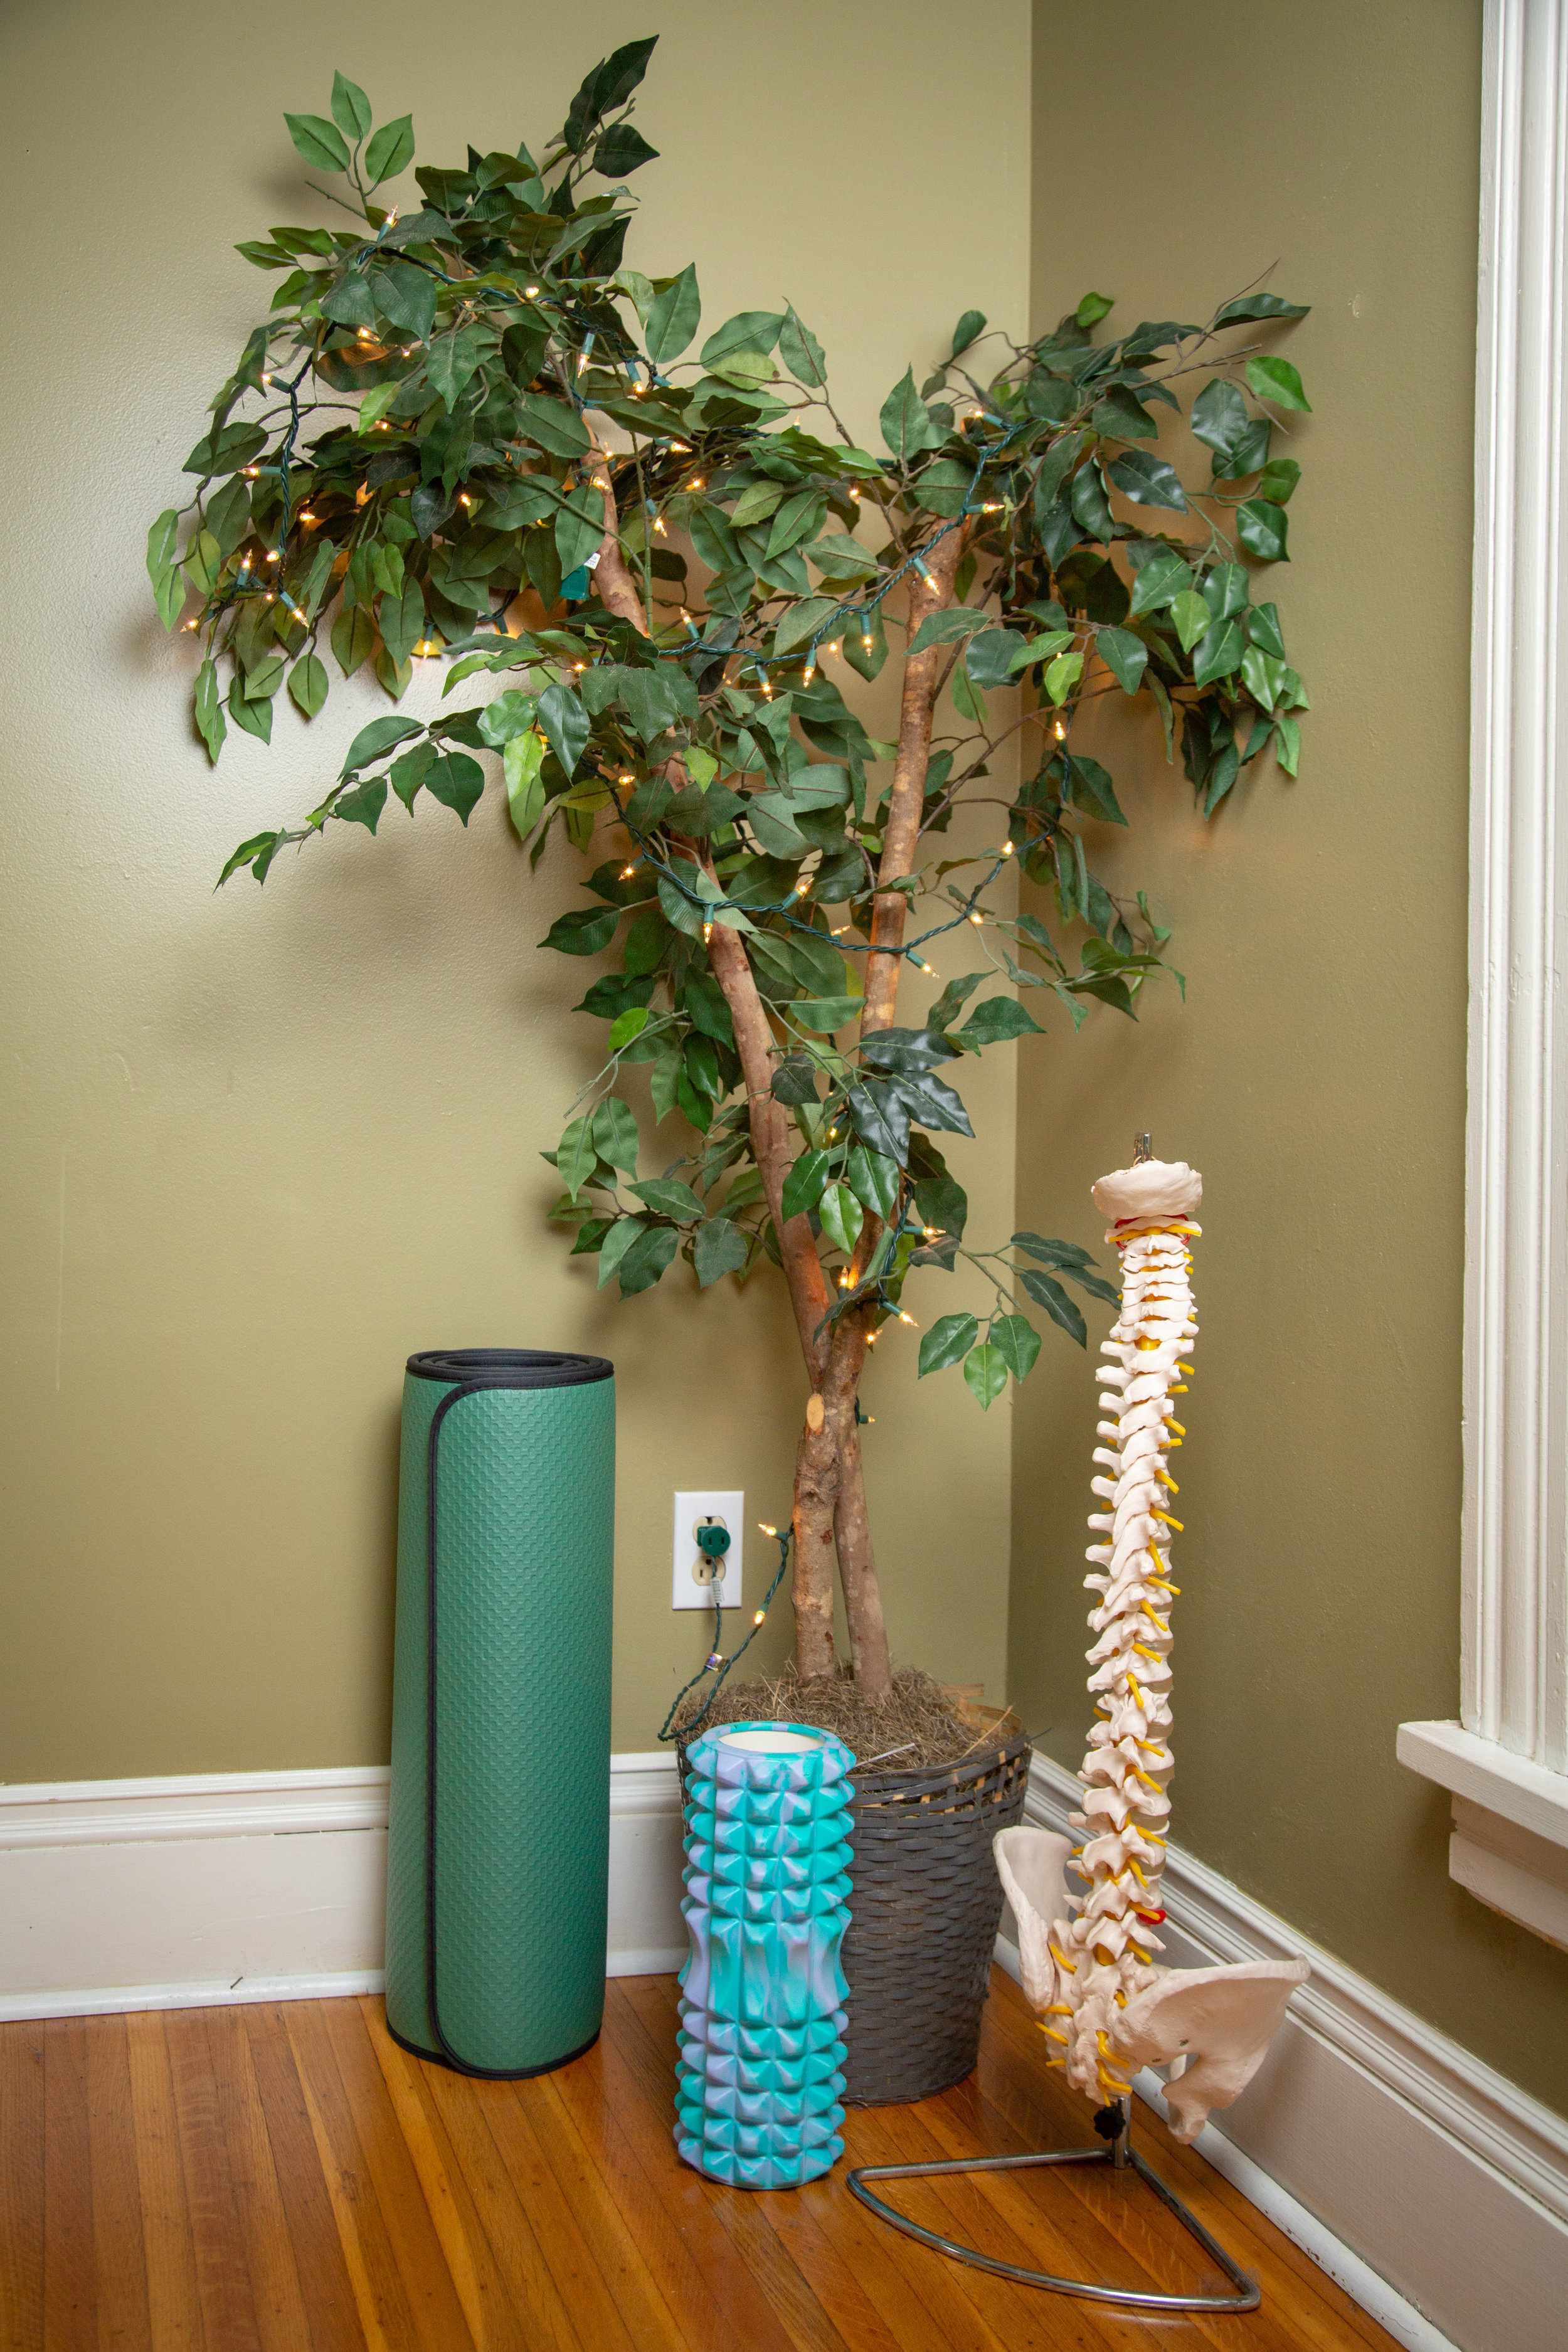 Chiropractor Rochester, NY | Chiropractor Rochester | Chiropractic Rochester | Rochester Chiropractor | Rochester Chiropractic |